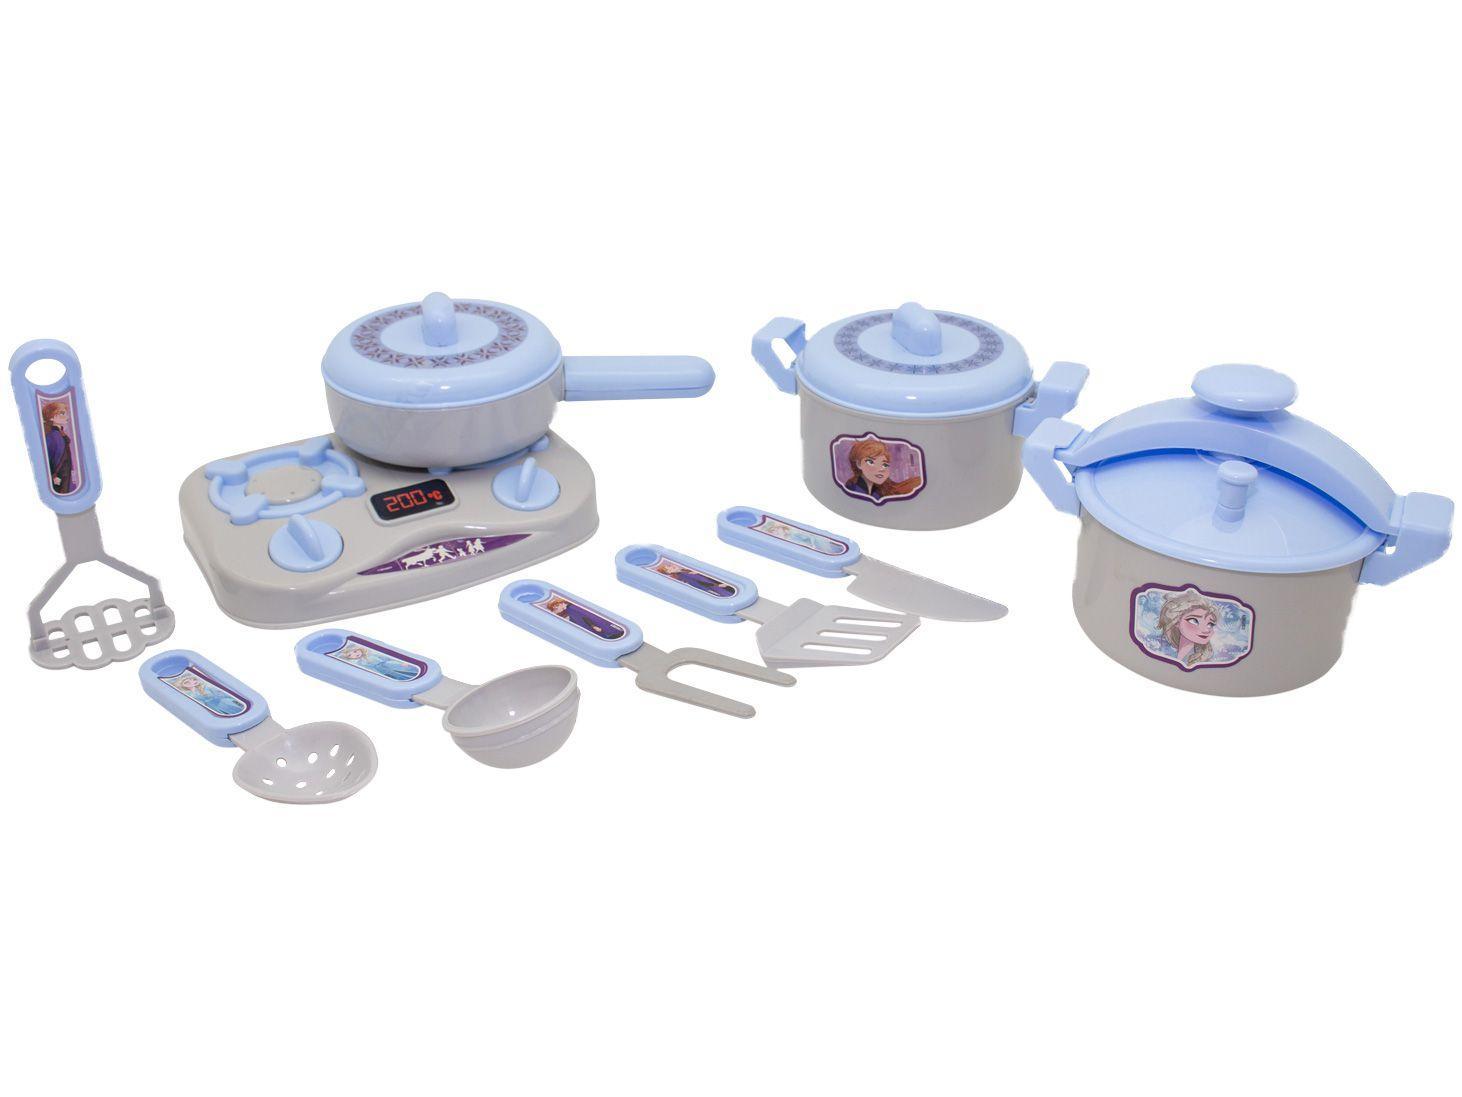 Kit Cozinha Infantil Frozen 2 Jogo de Panelas - Toyng 10 Peças